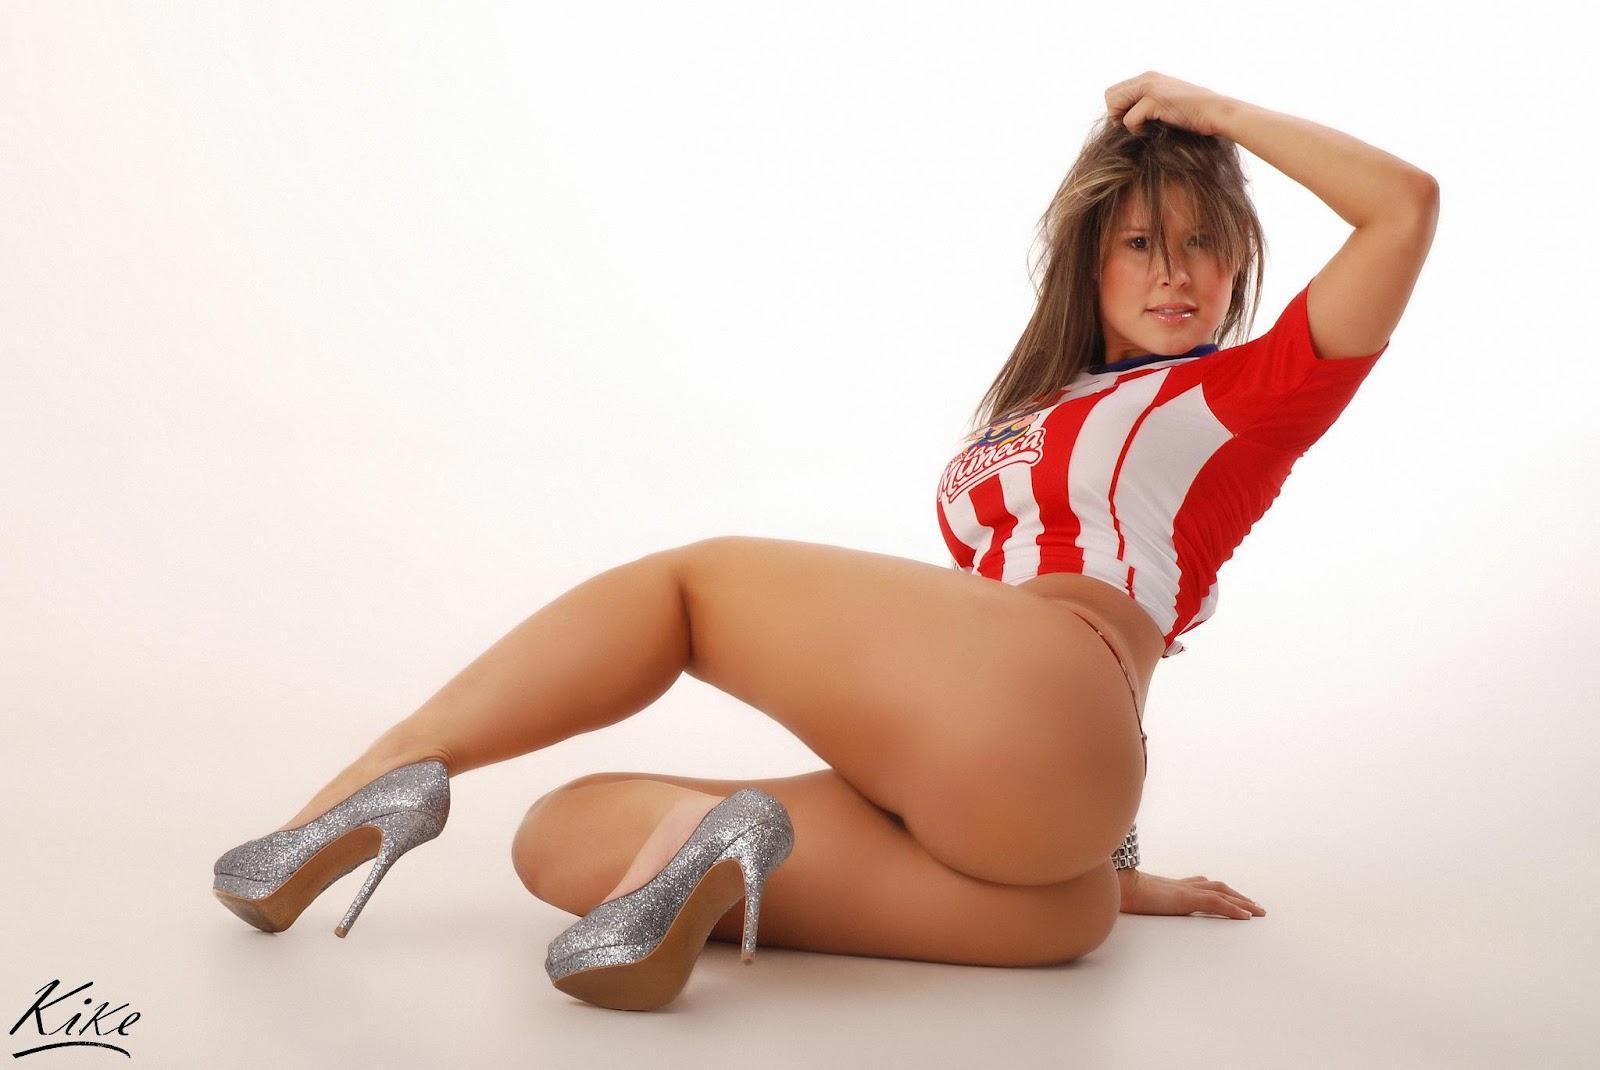 Amateur latin chica de veracruz 01 1